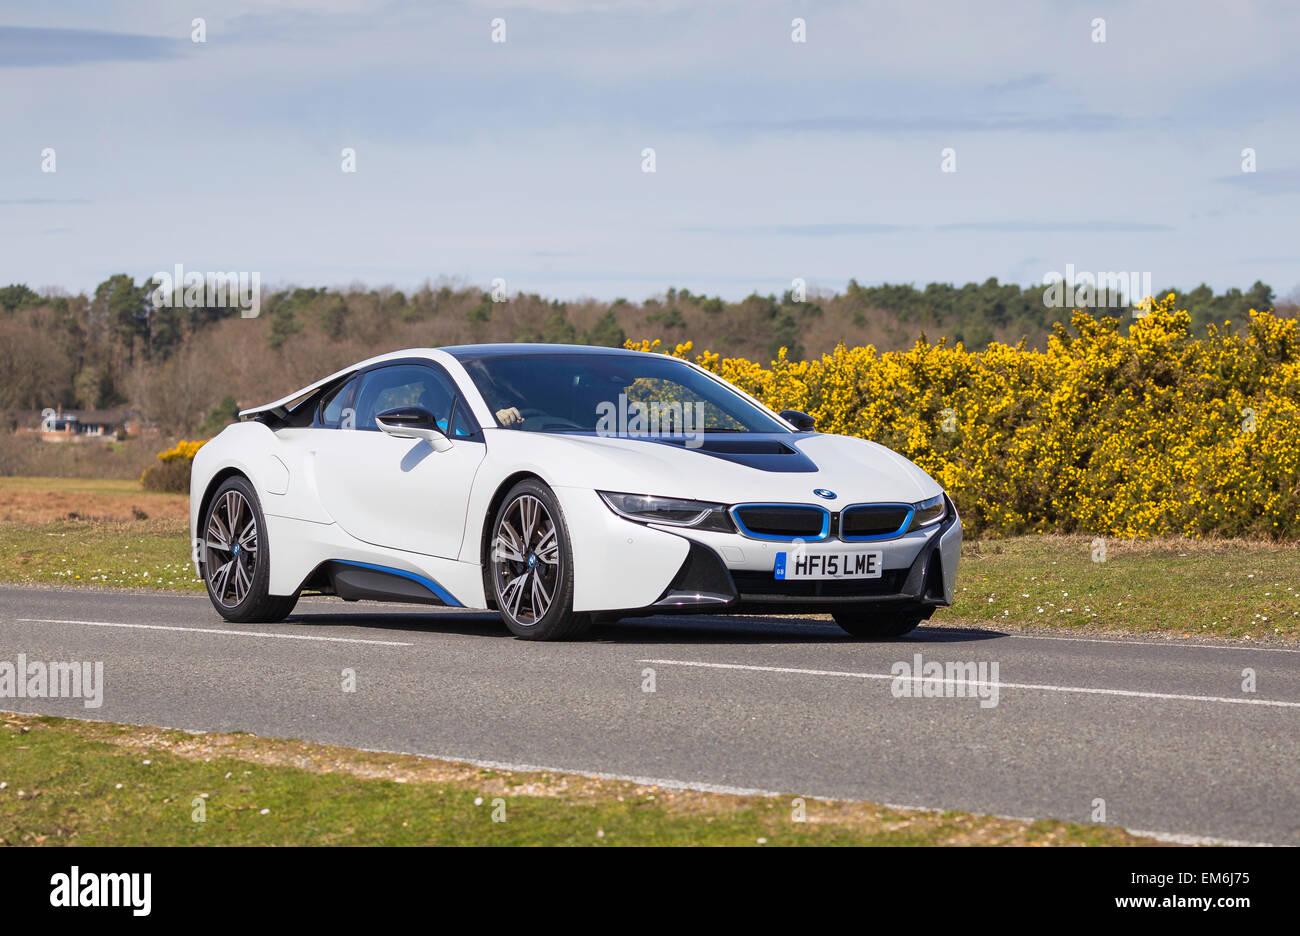 A White Bmw I8 Hybrid Electric Sports Car Drives Through The New